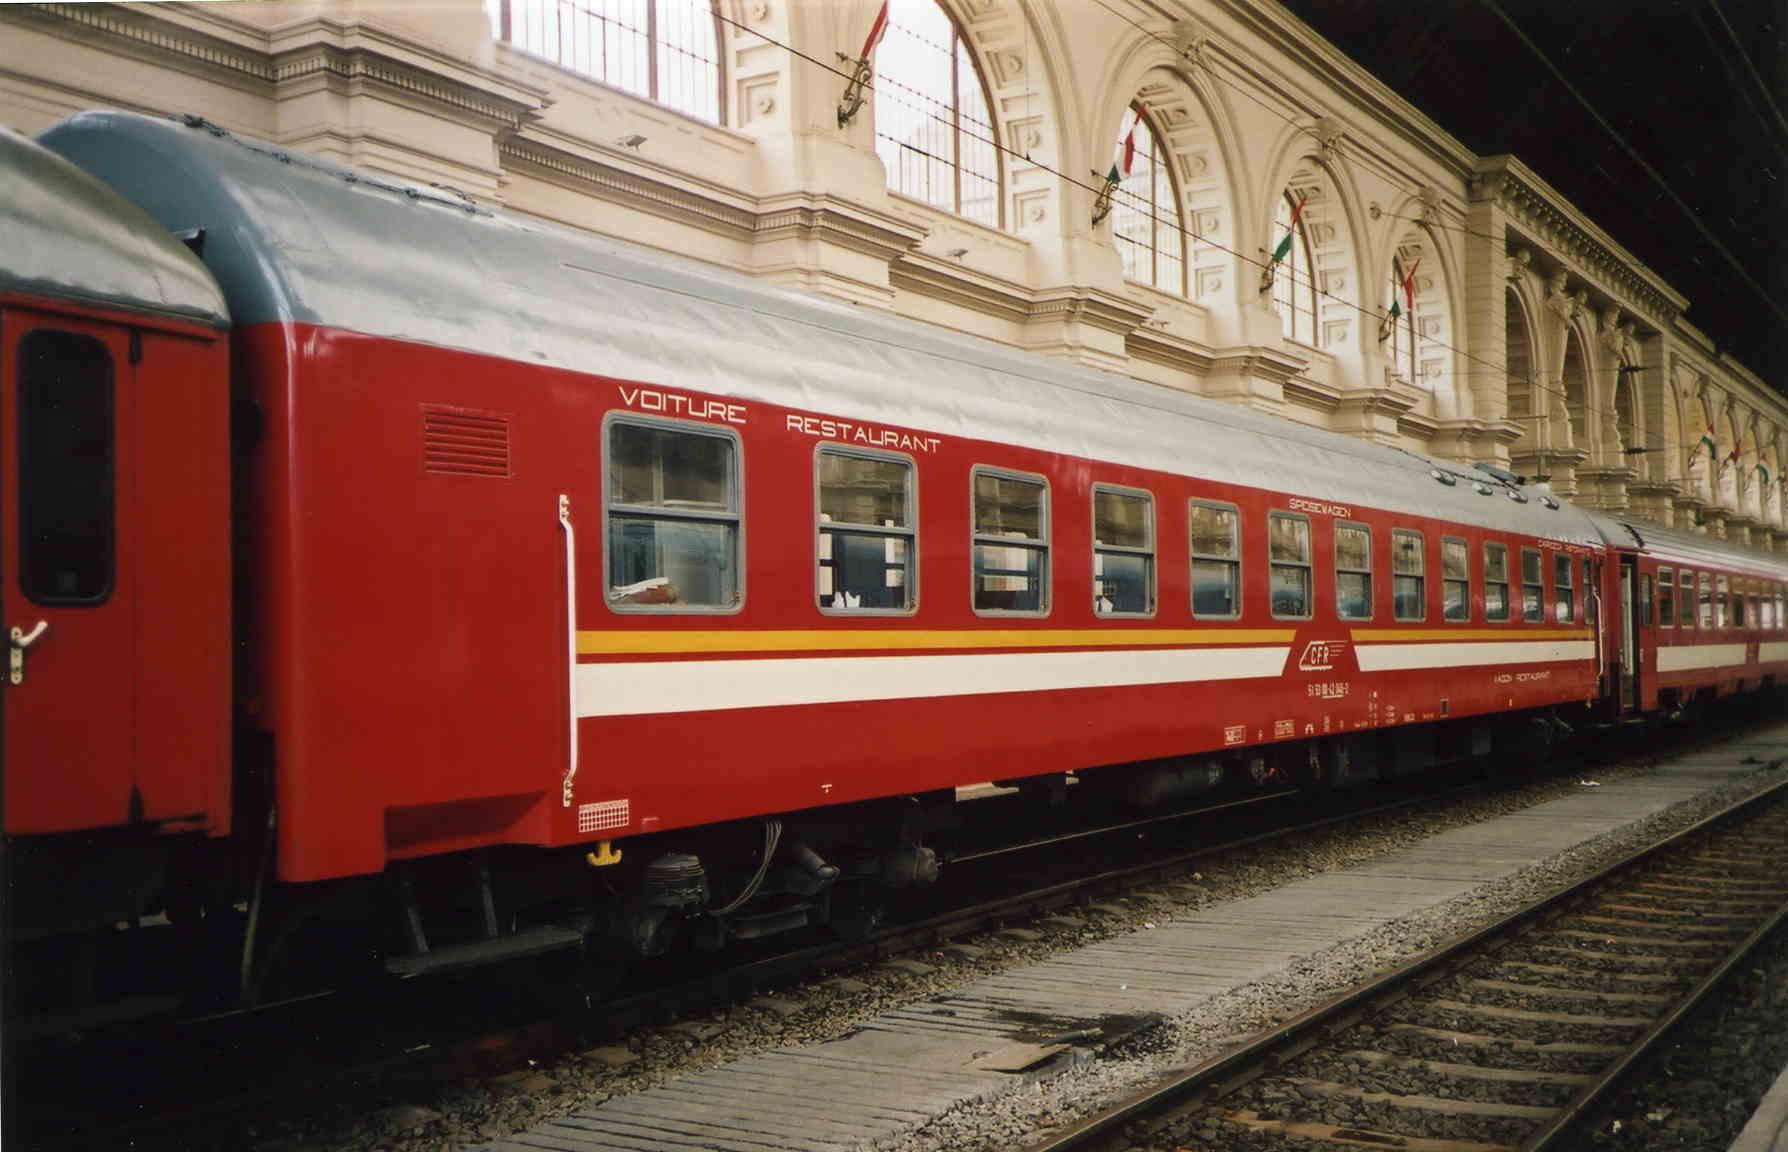 http://www.railfaneurope.net/pix/ro/car/restaurant/88-42/CFR-WR.jpg